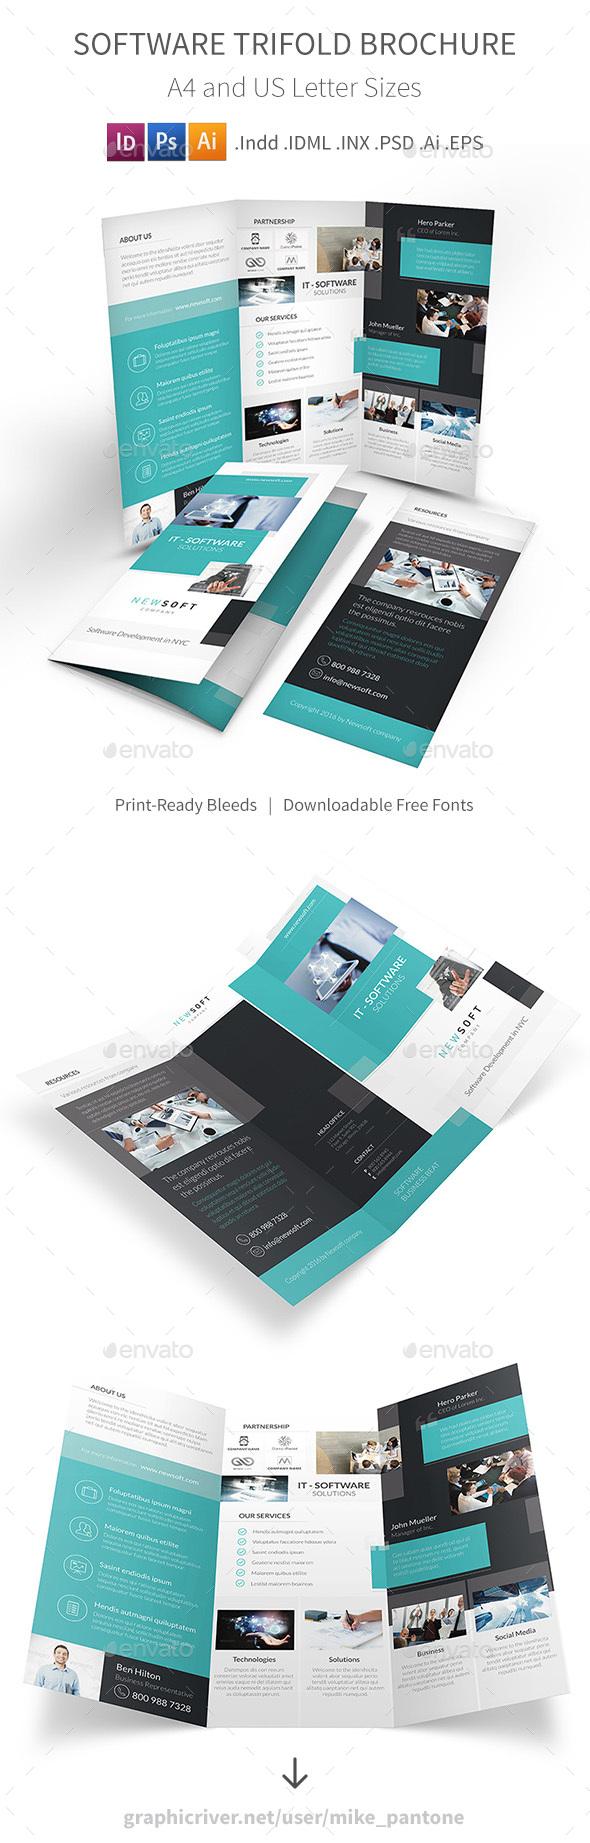 Software Company Trifold Brochure Brochure Templates Pinterest